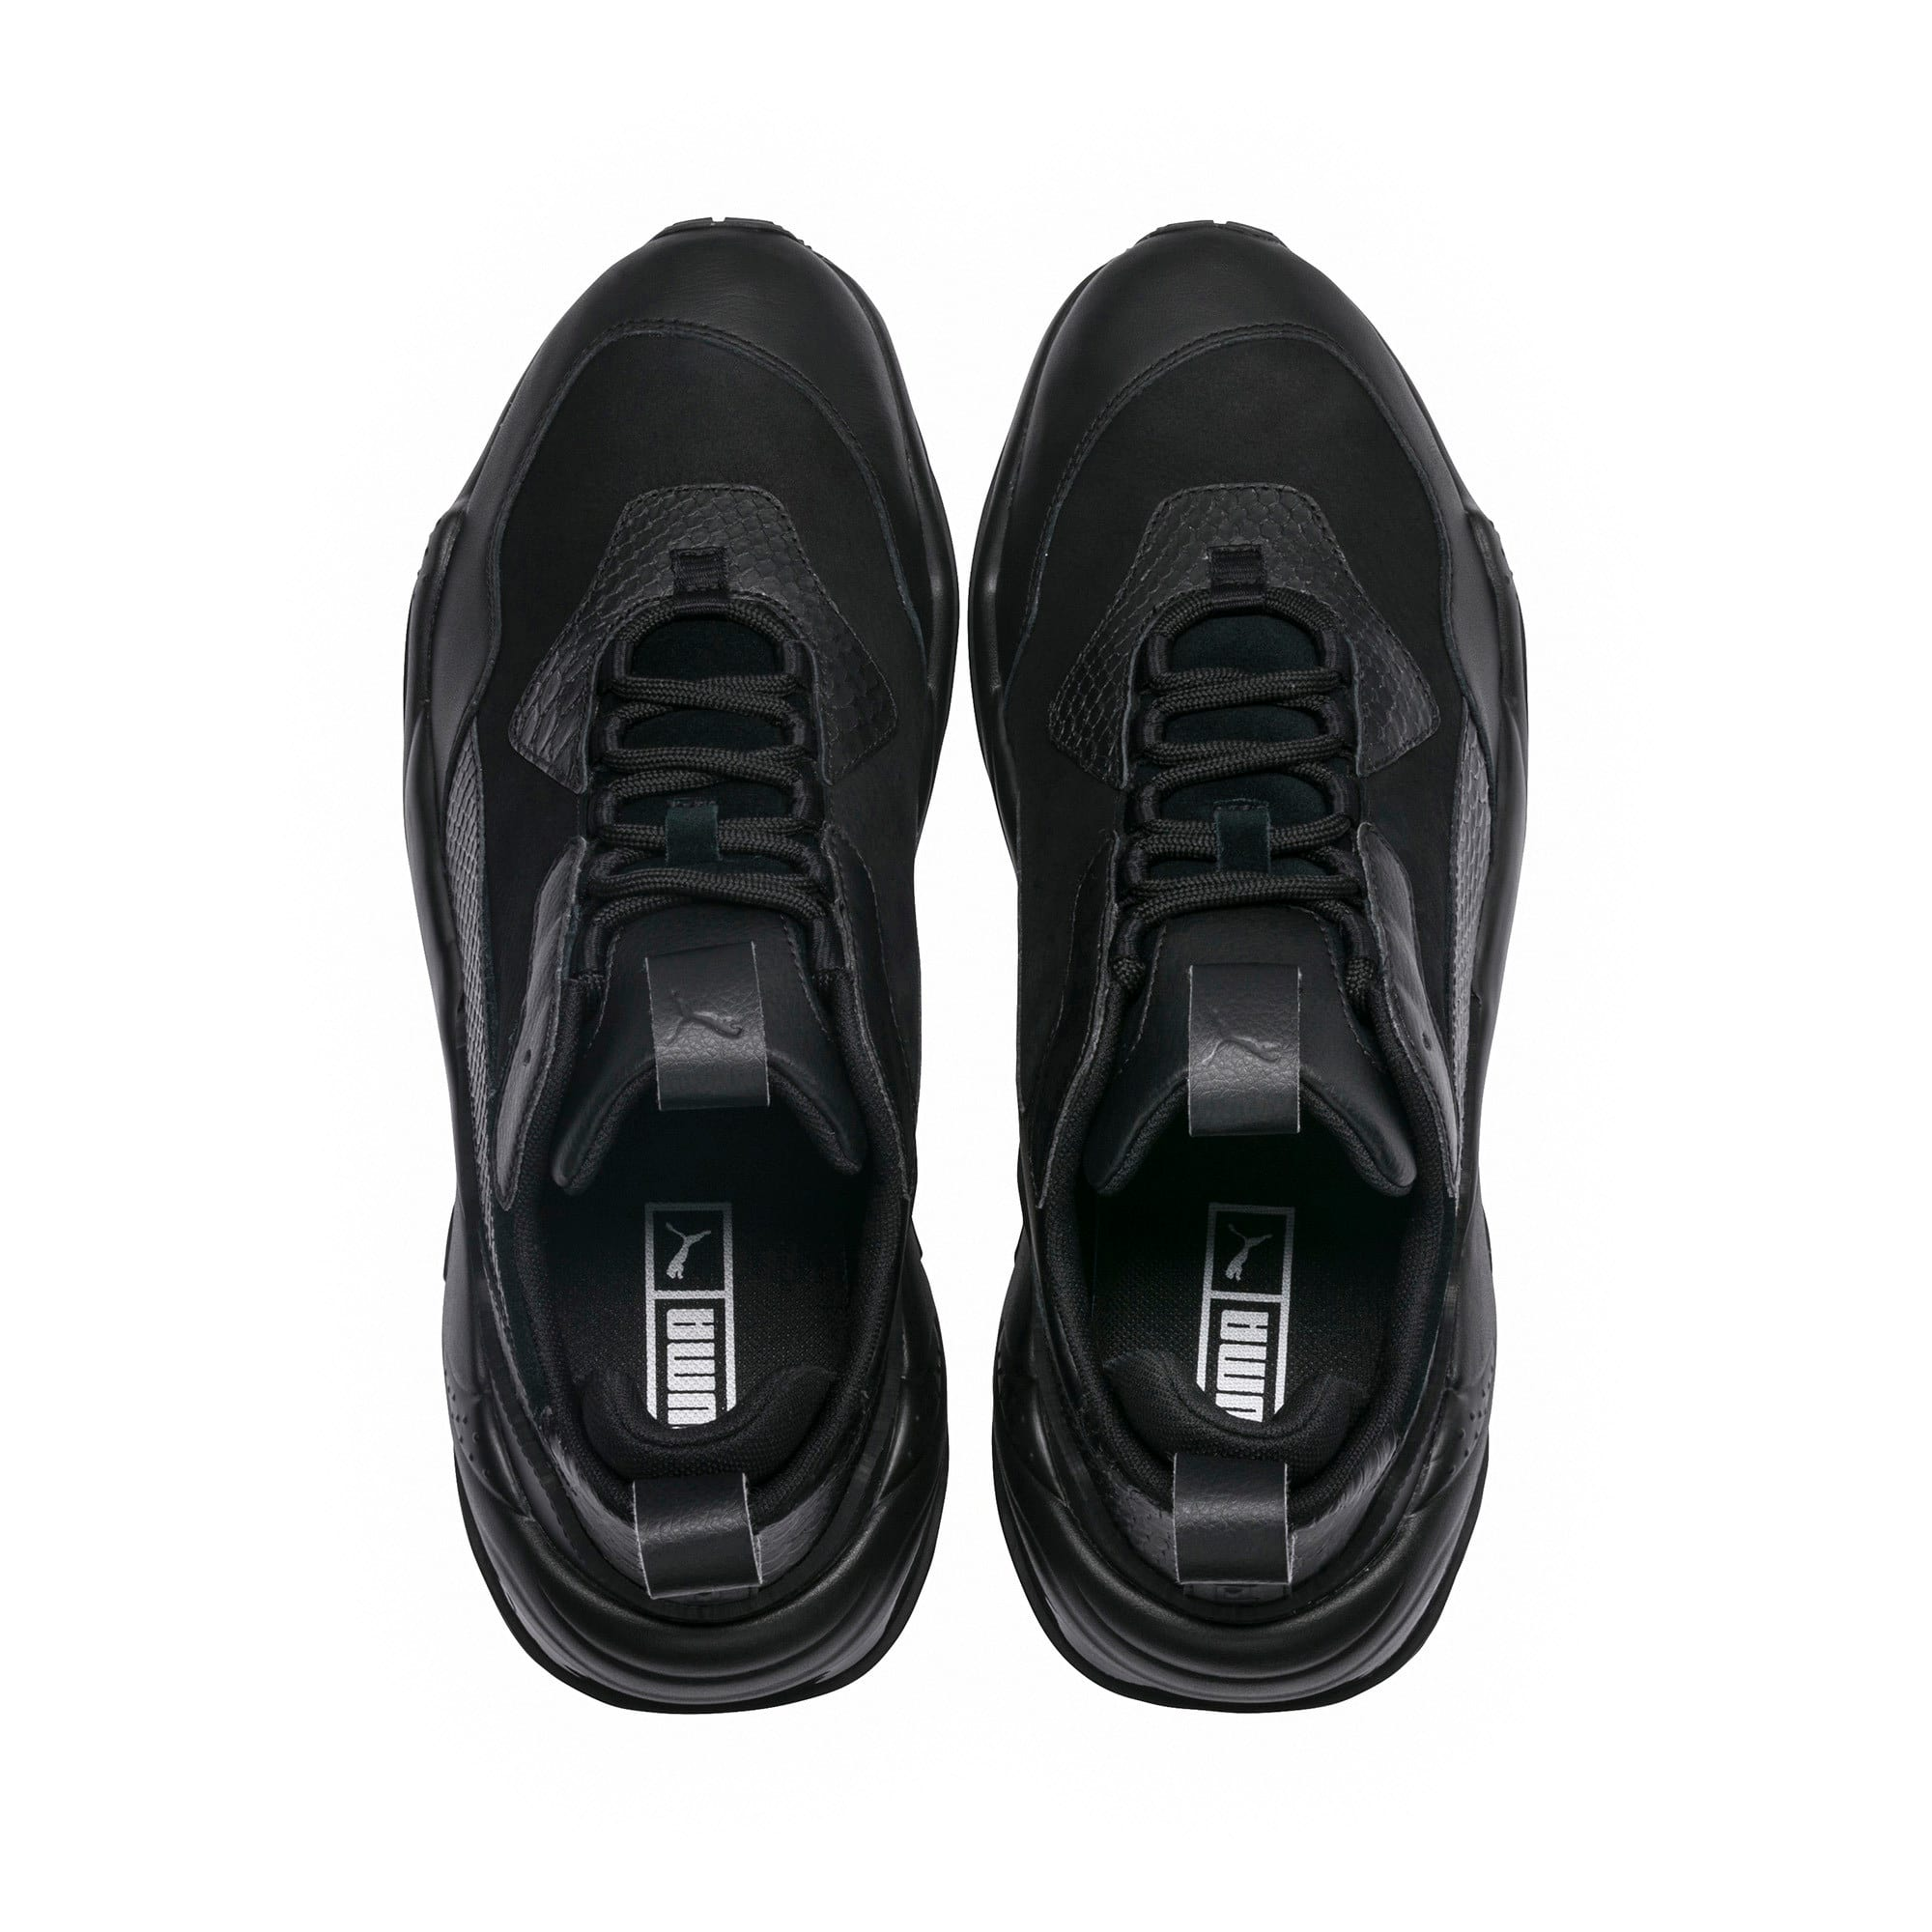 Thumbnail 6 of Thunder Desert Sneakers, Black-Puma Black-Black, medium